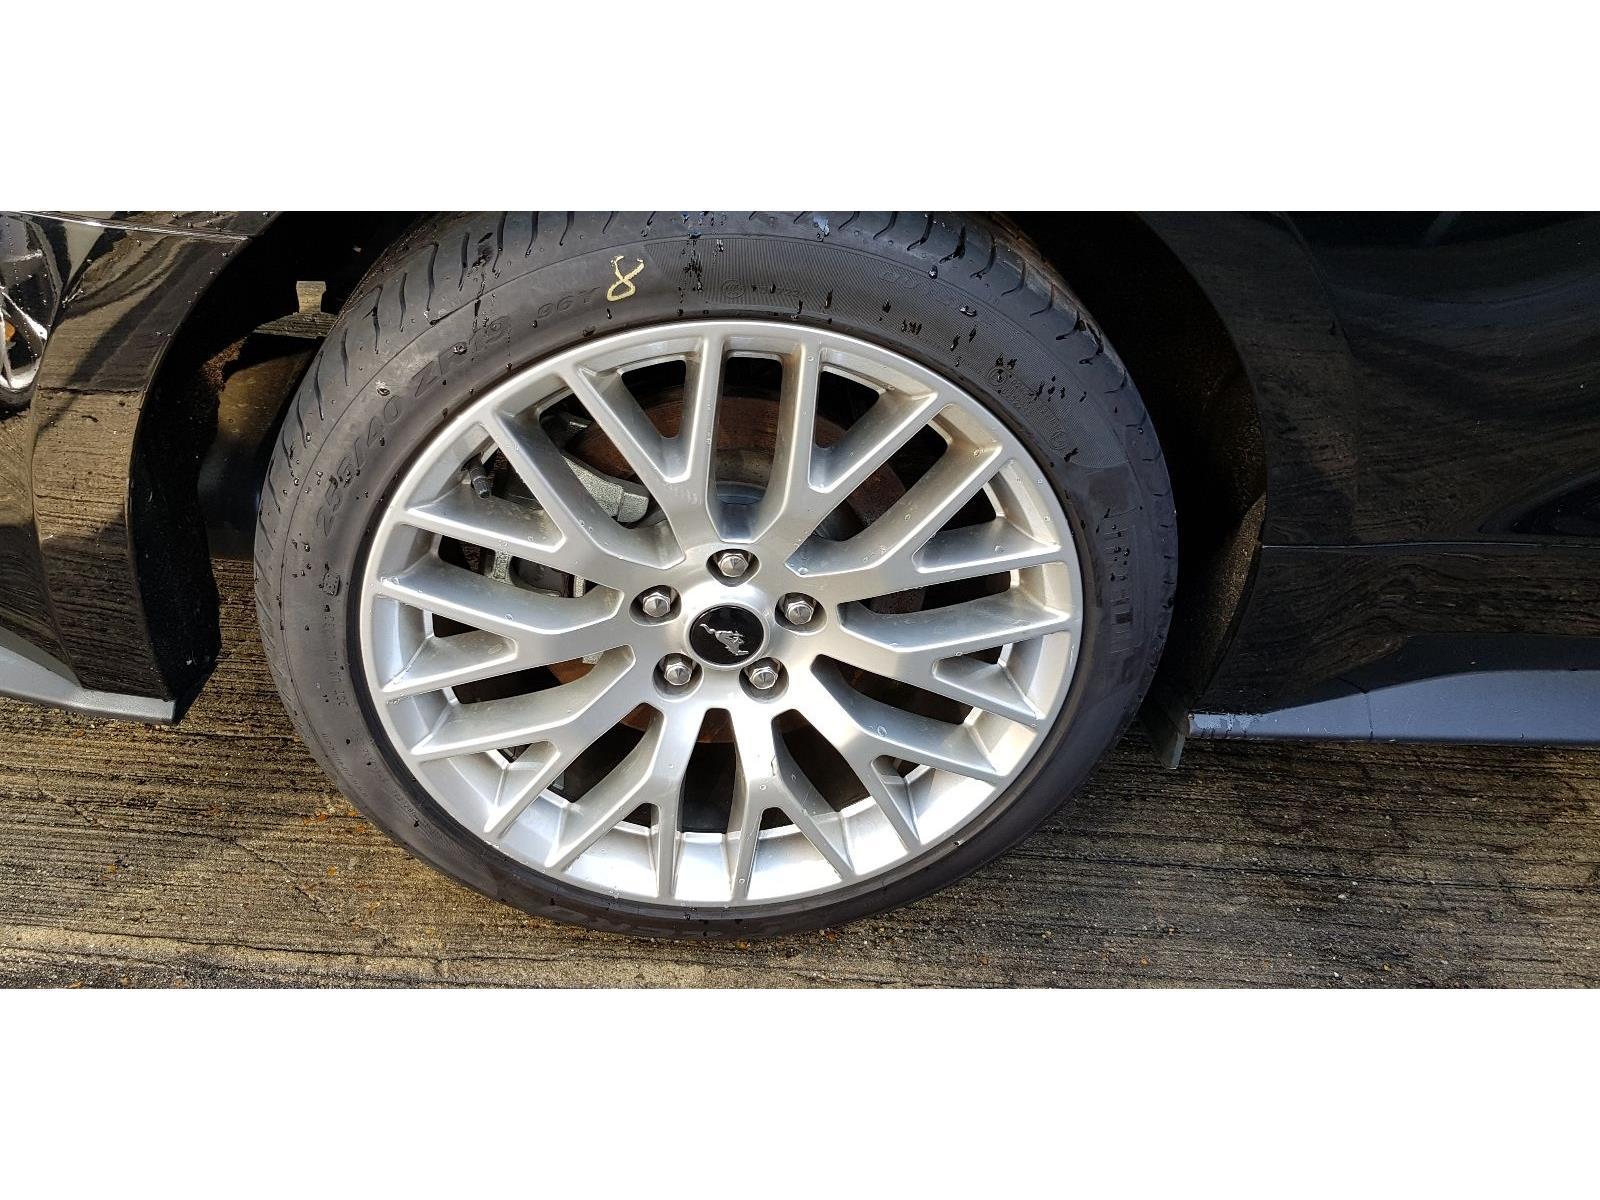 Ford Mustang 2015 To 2018 EcoBoost 2 Door Coupe / scrap